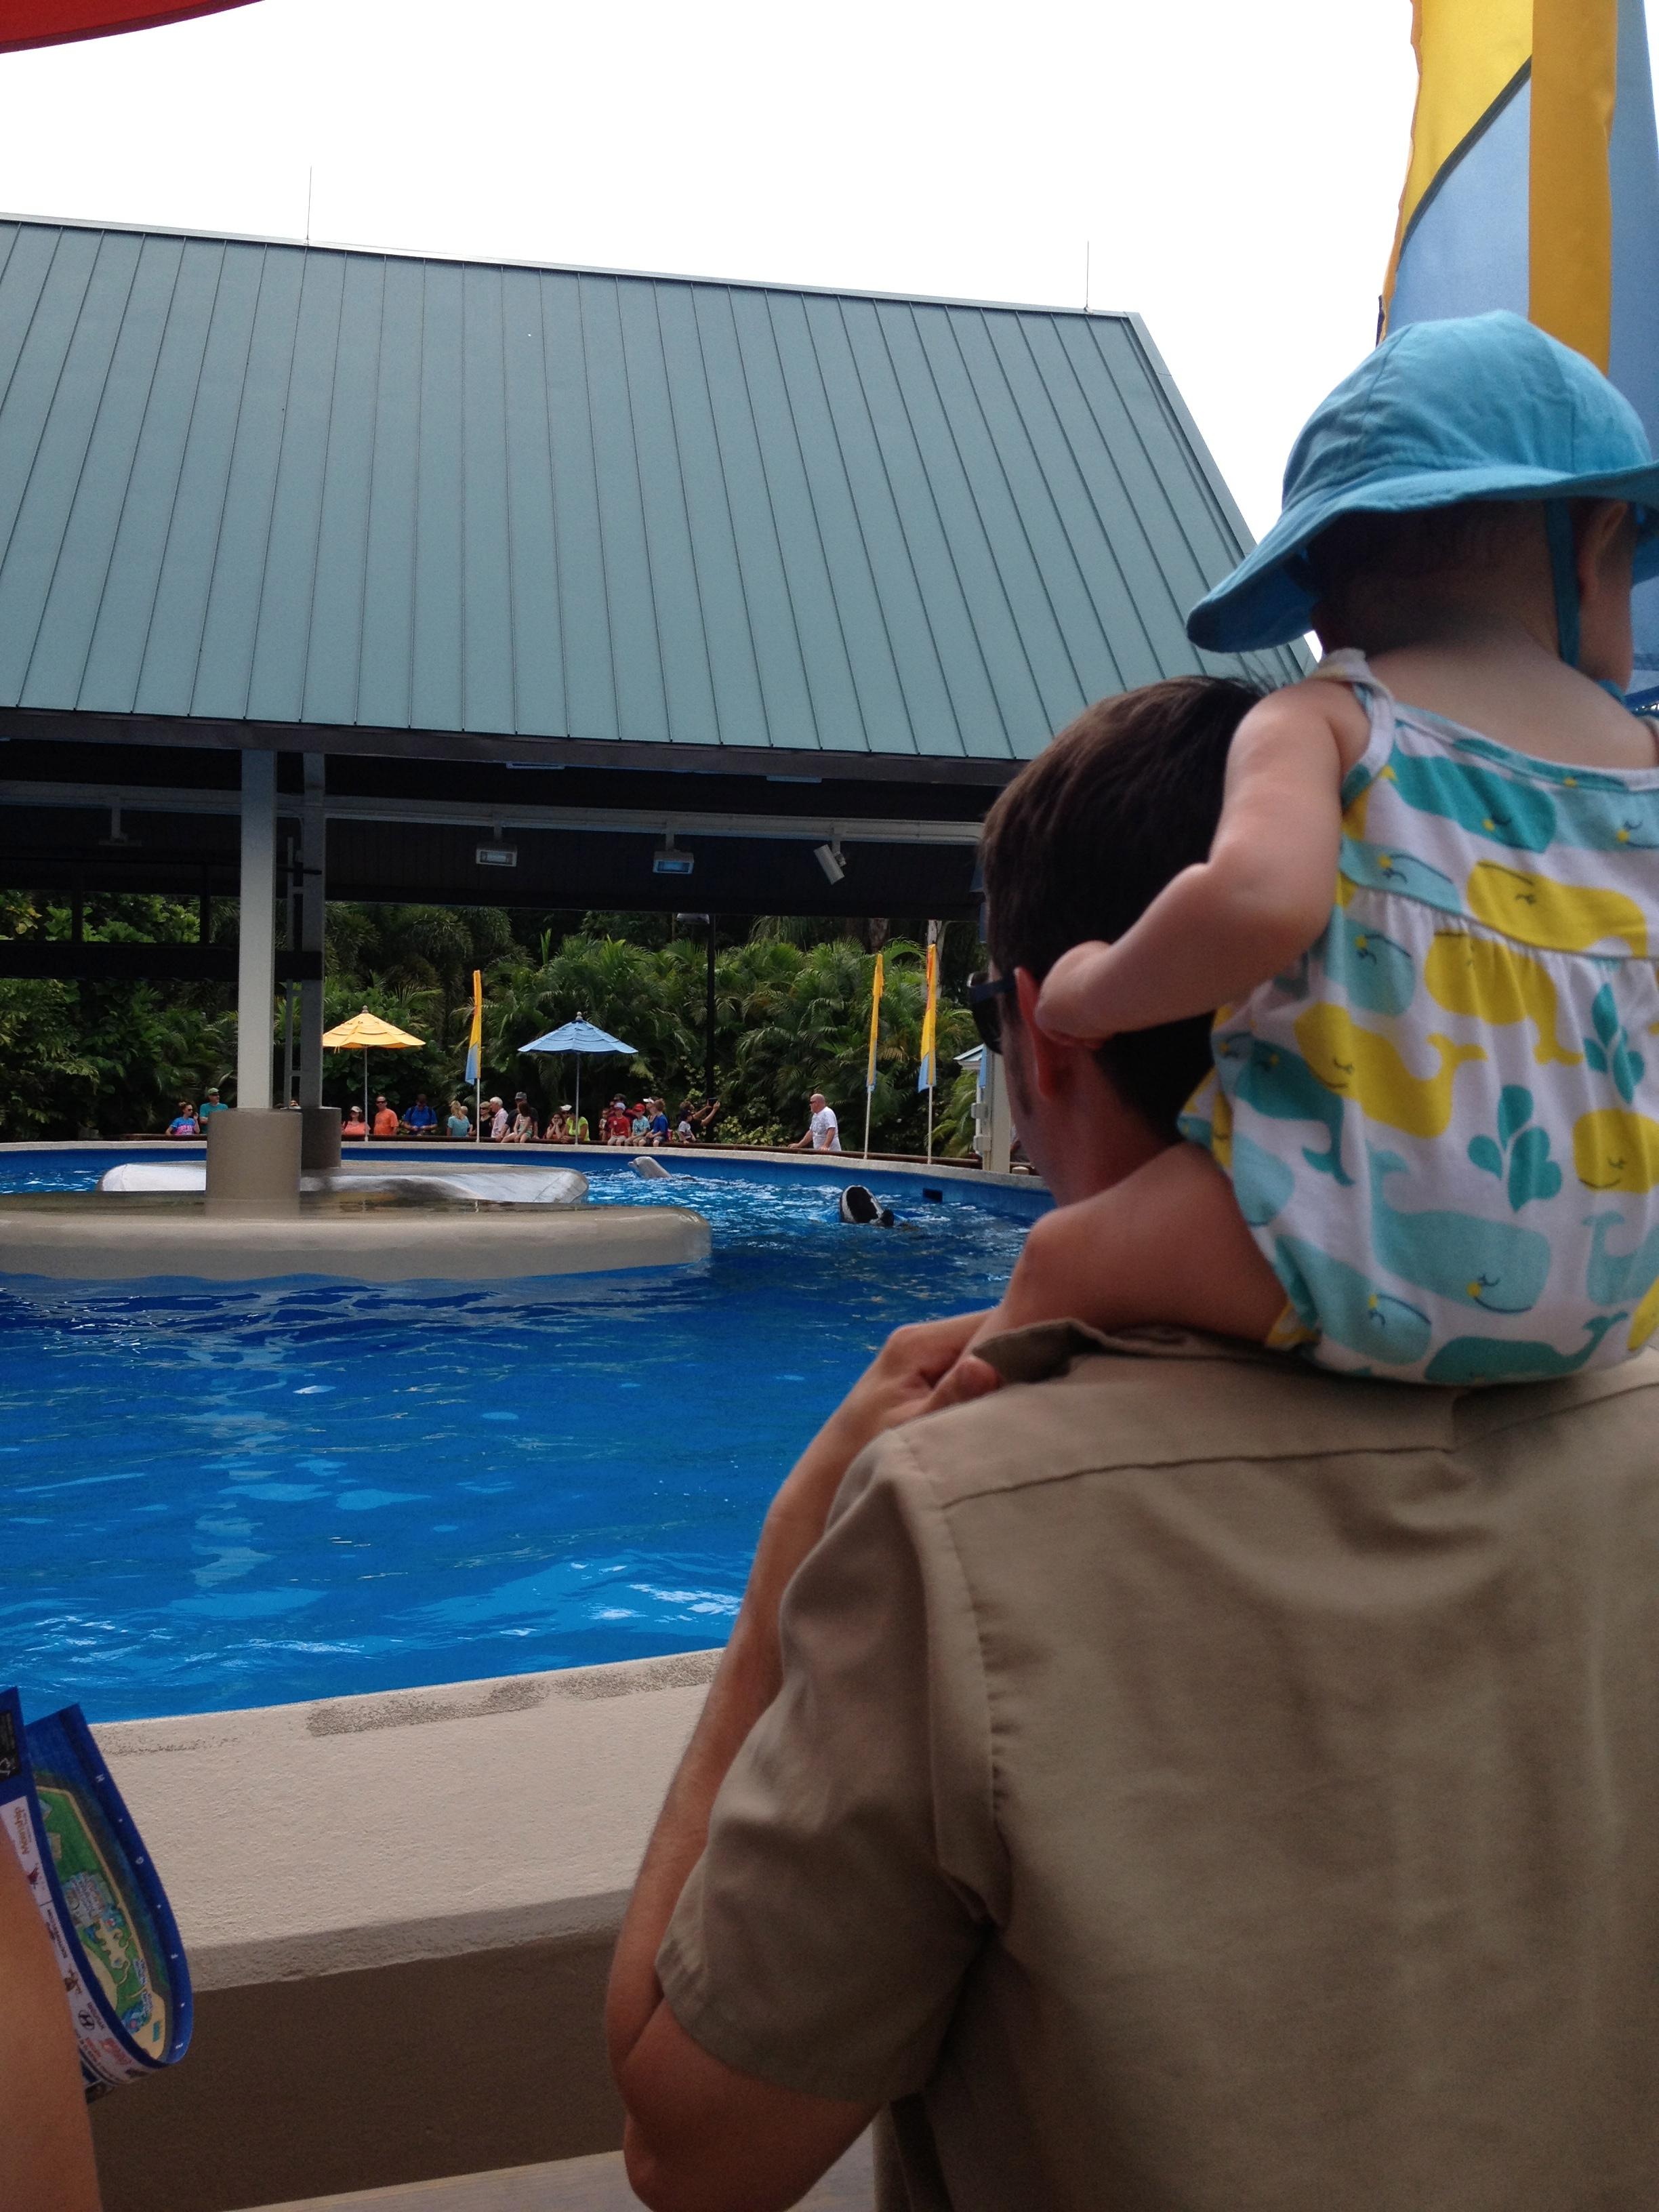 Watching the Dolphin Nursery